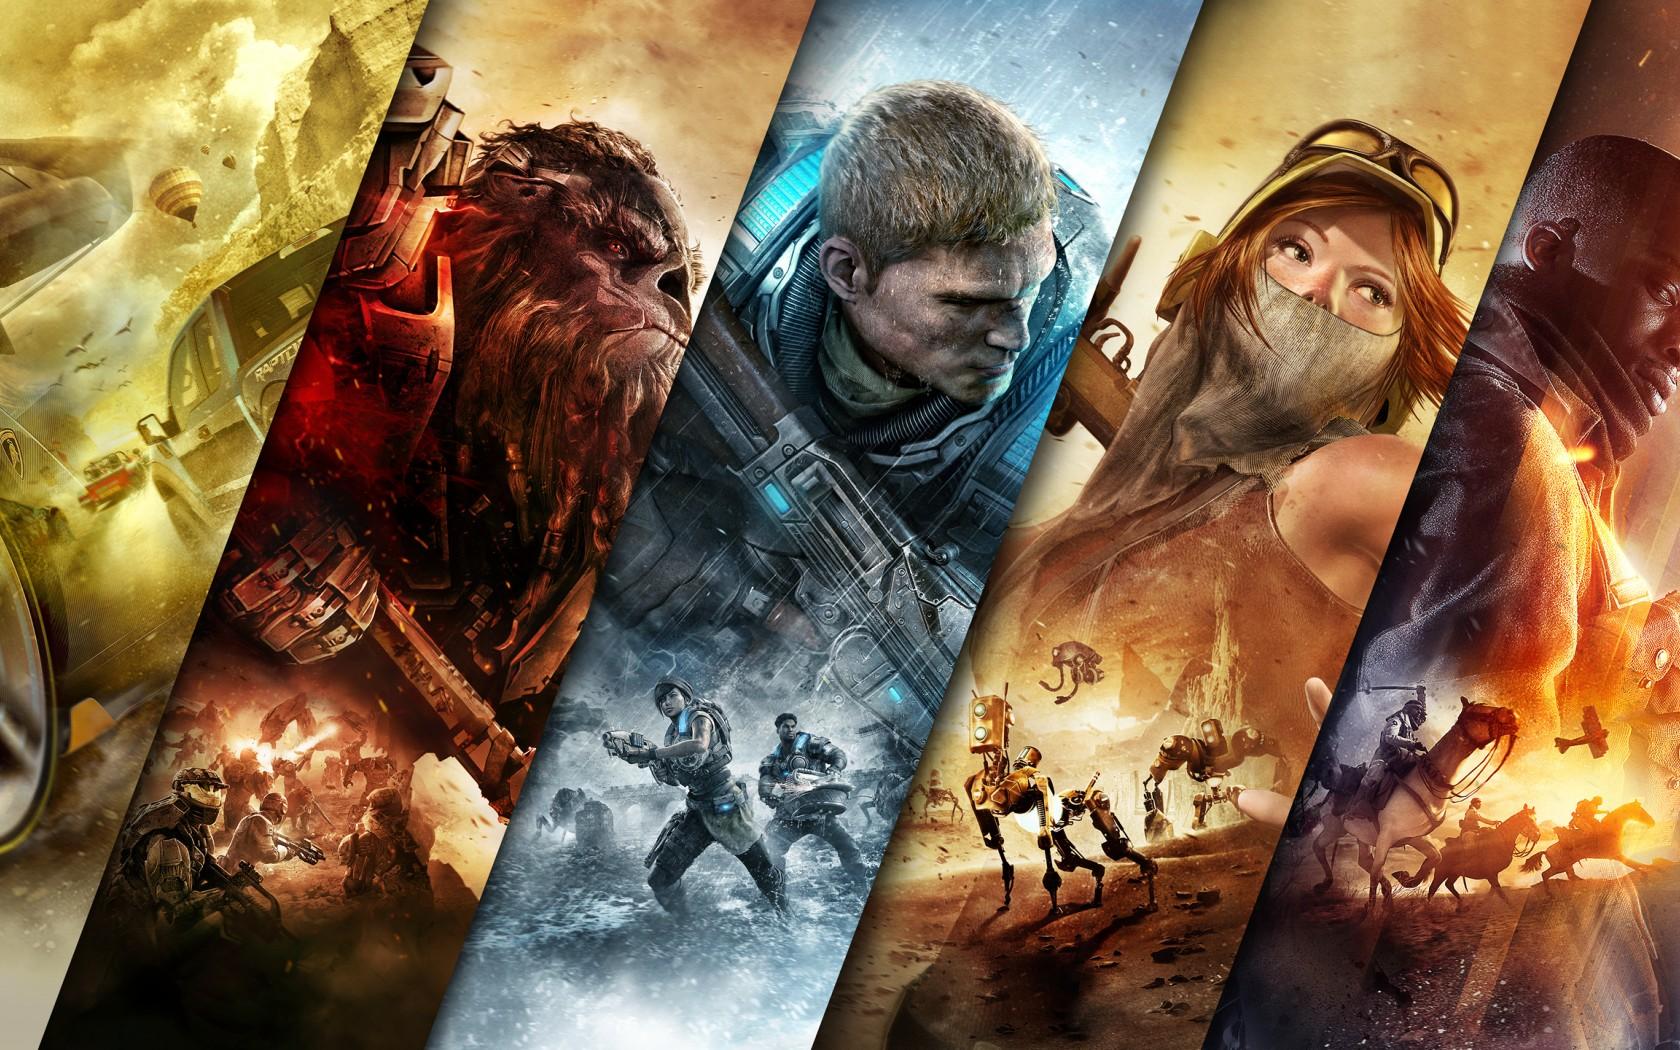 forza_horizon_3_halo_wars_2_gears_of_war_4_recore_battlefield_1_110681_1680x1050